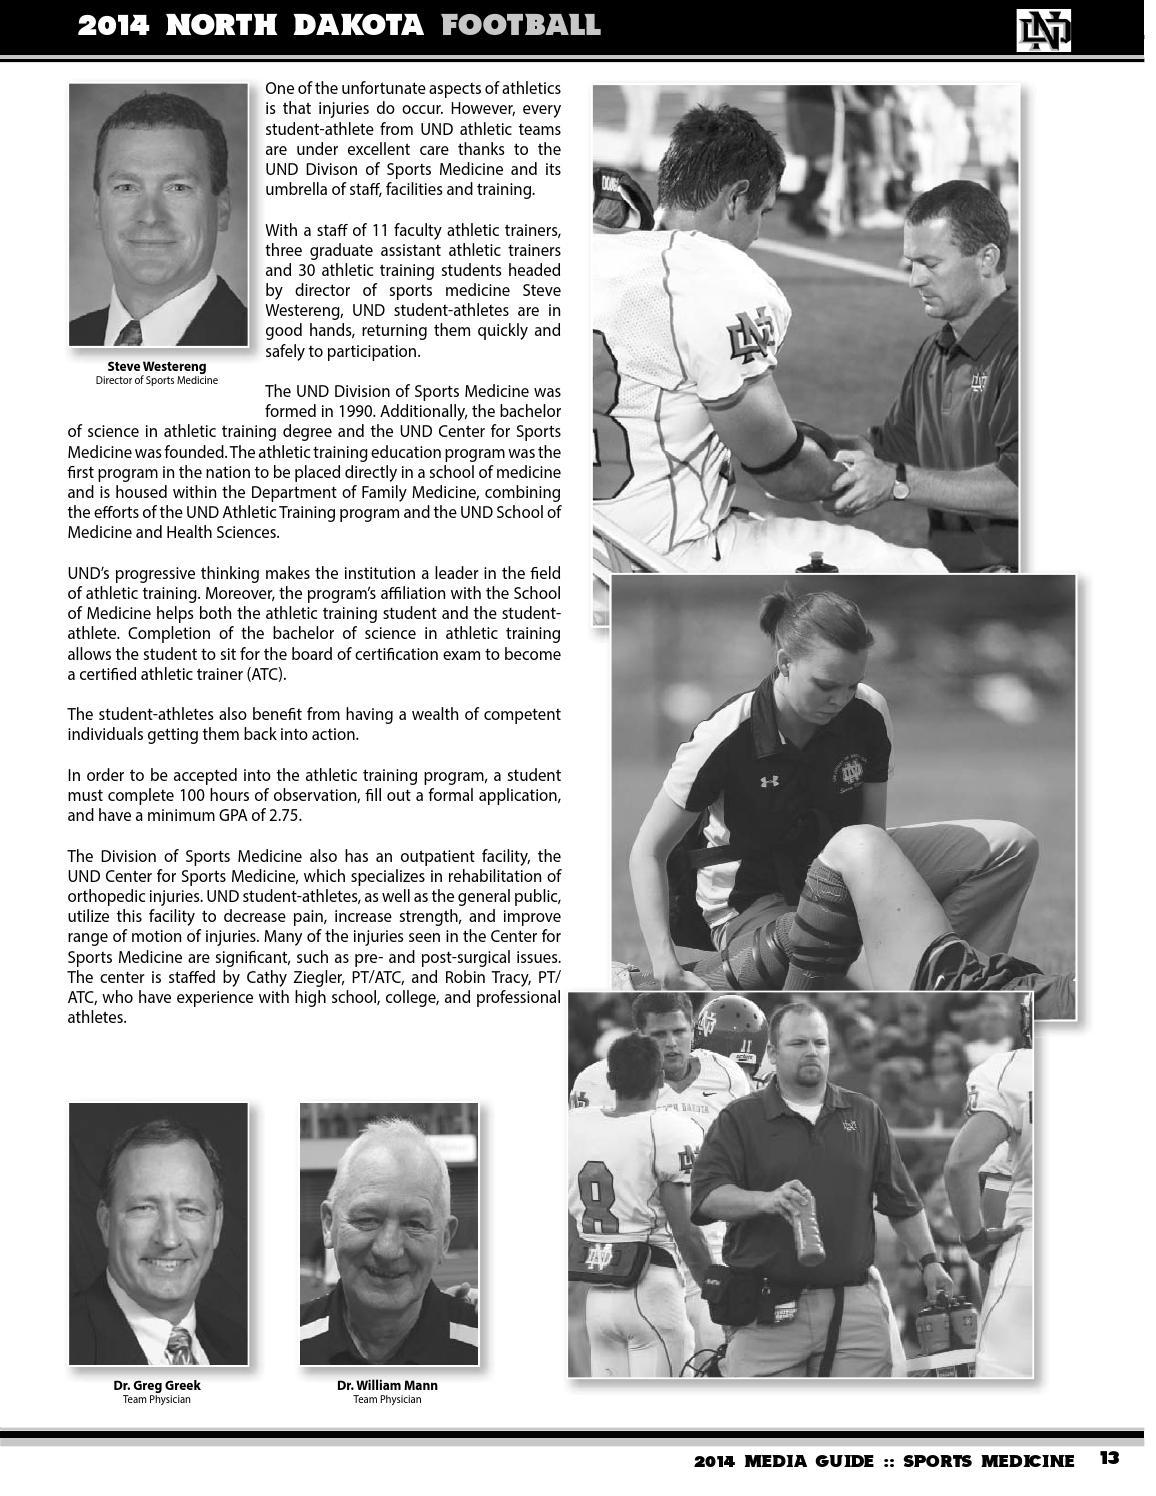 2014 UND Football Media Guide by University of North Dakota